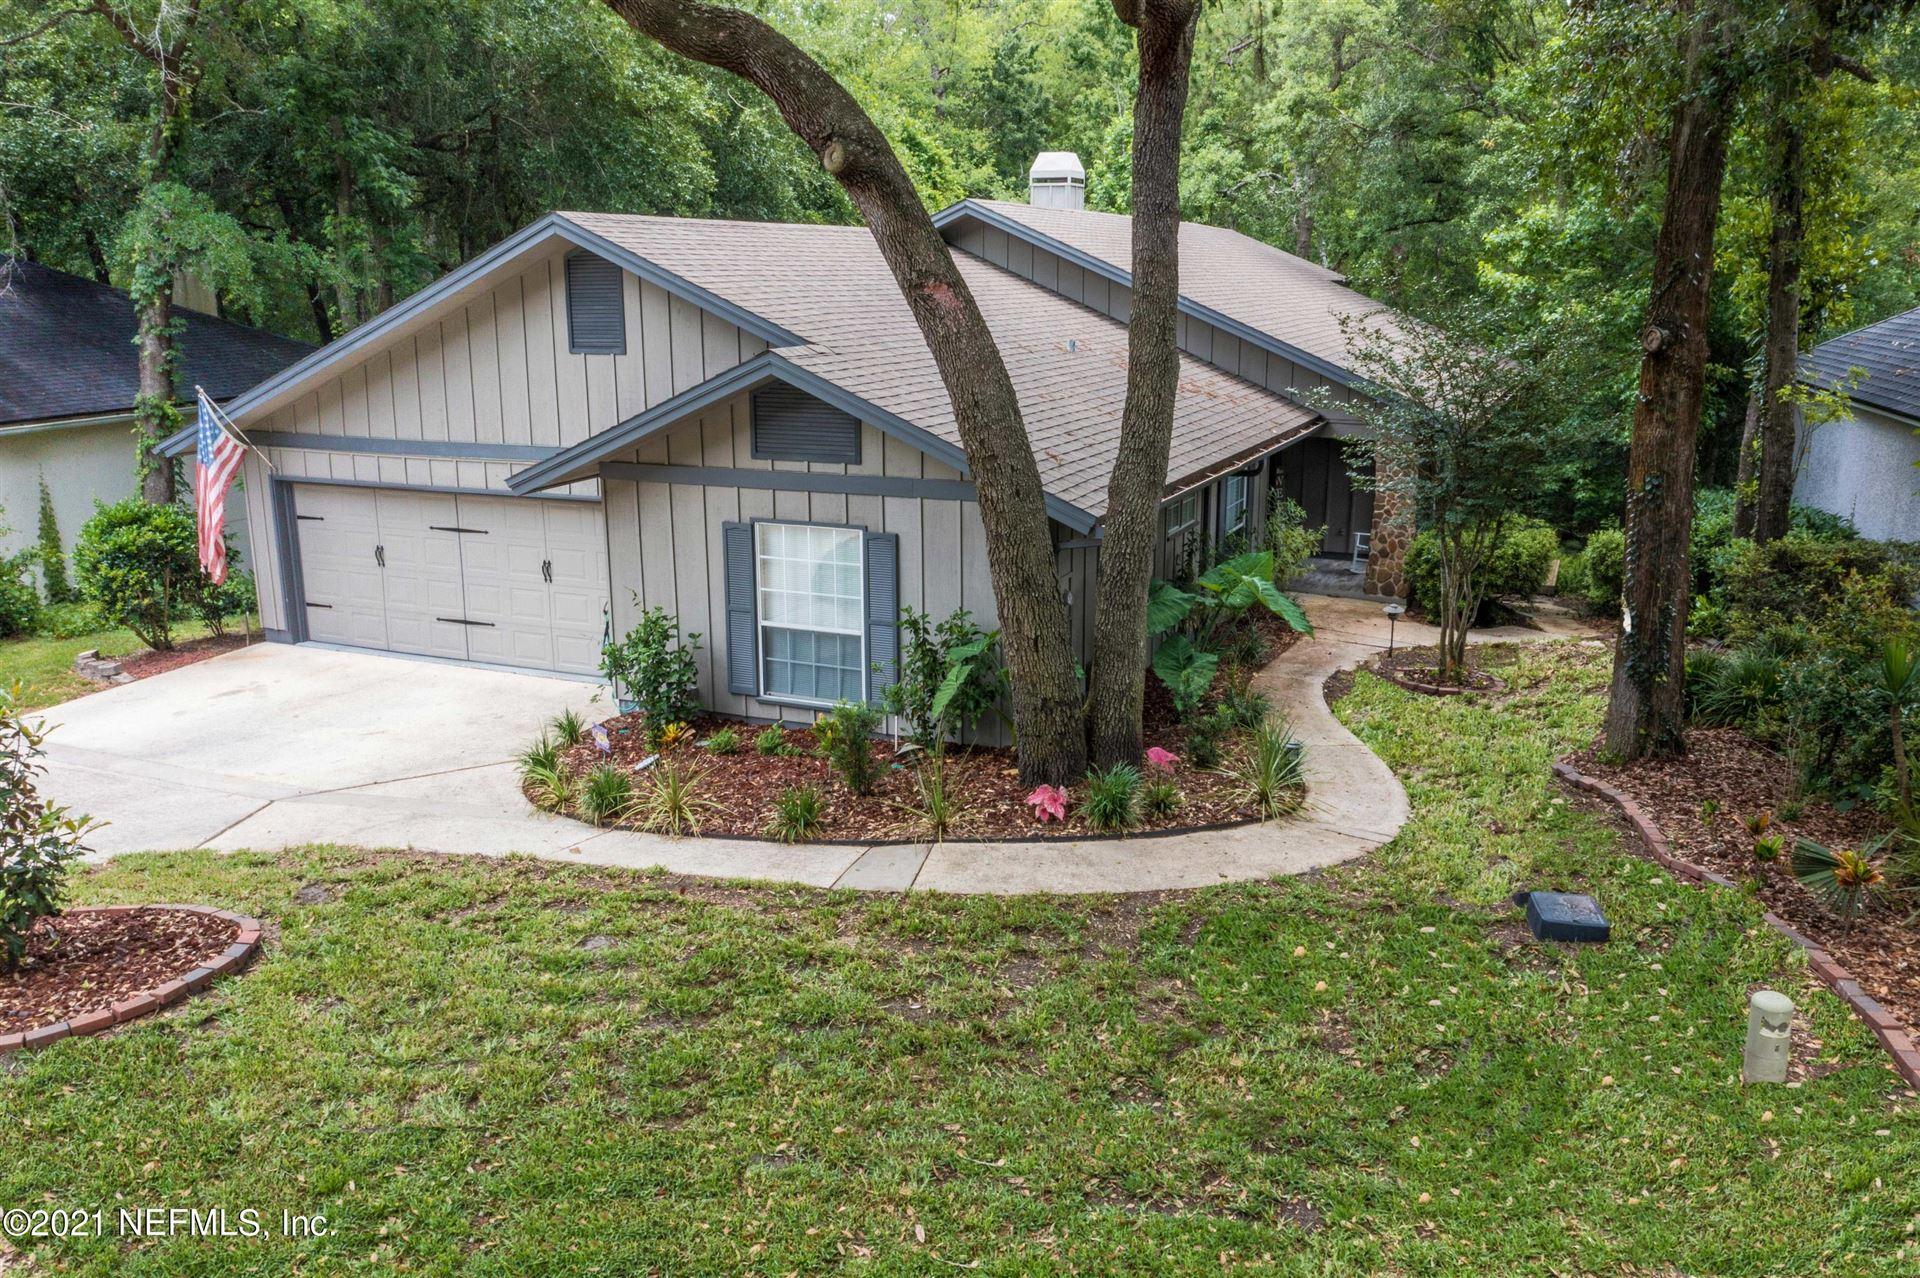 1514 STONEBRIAR RD, Green Cove Springs, FL 32043 - MLS#: 1109657